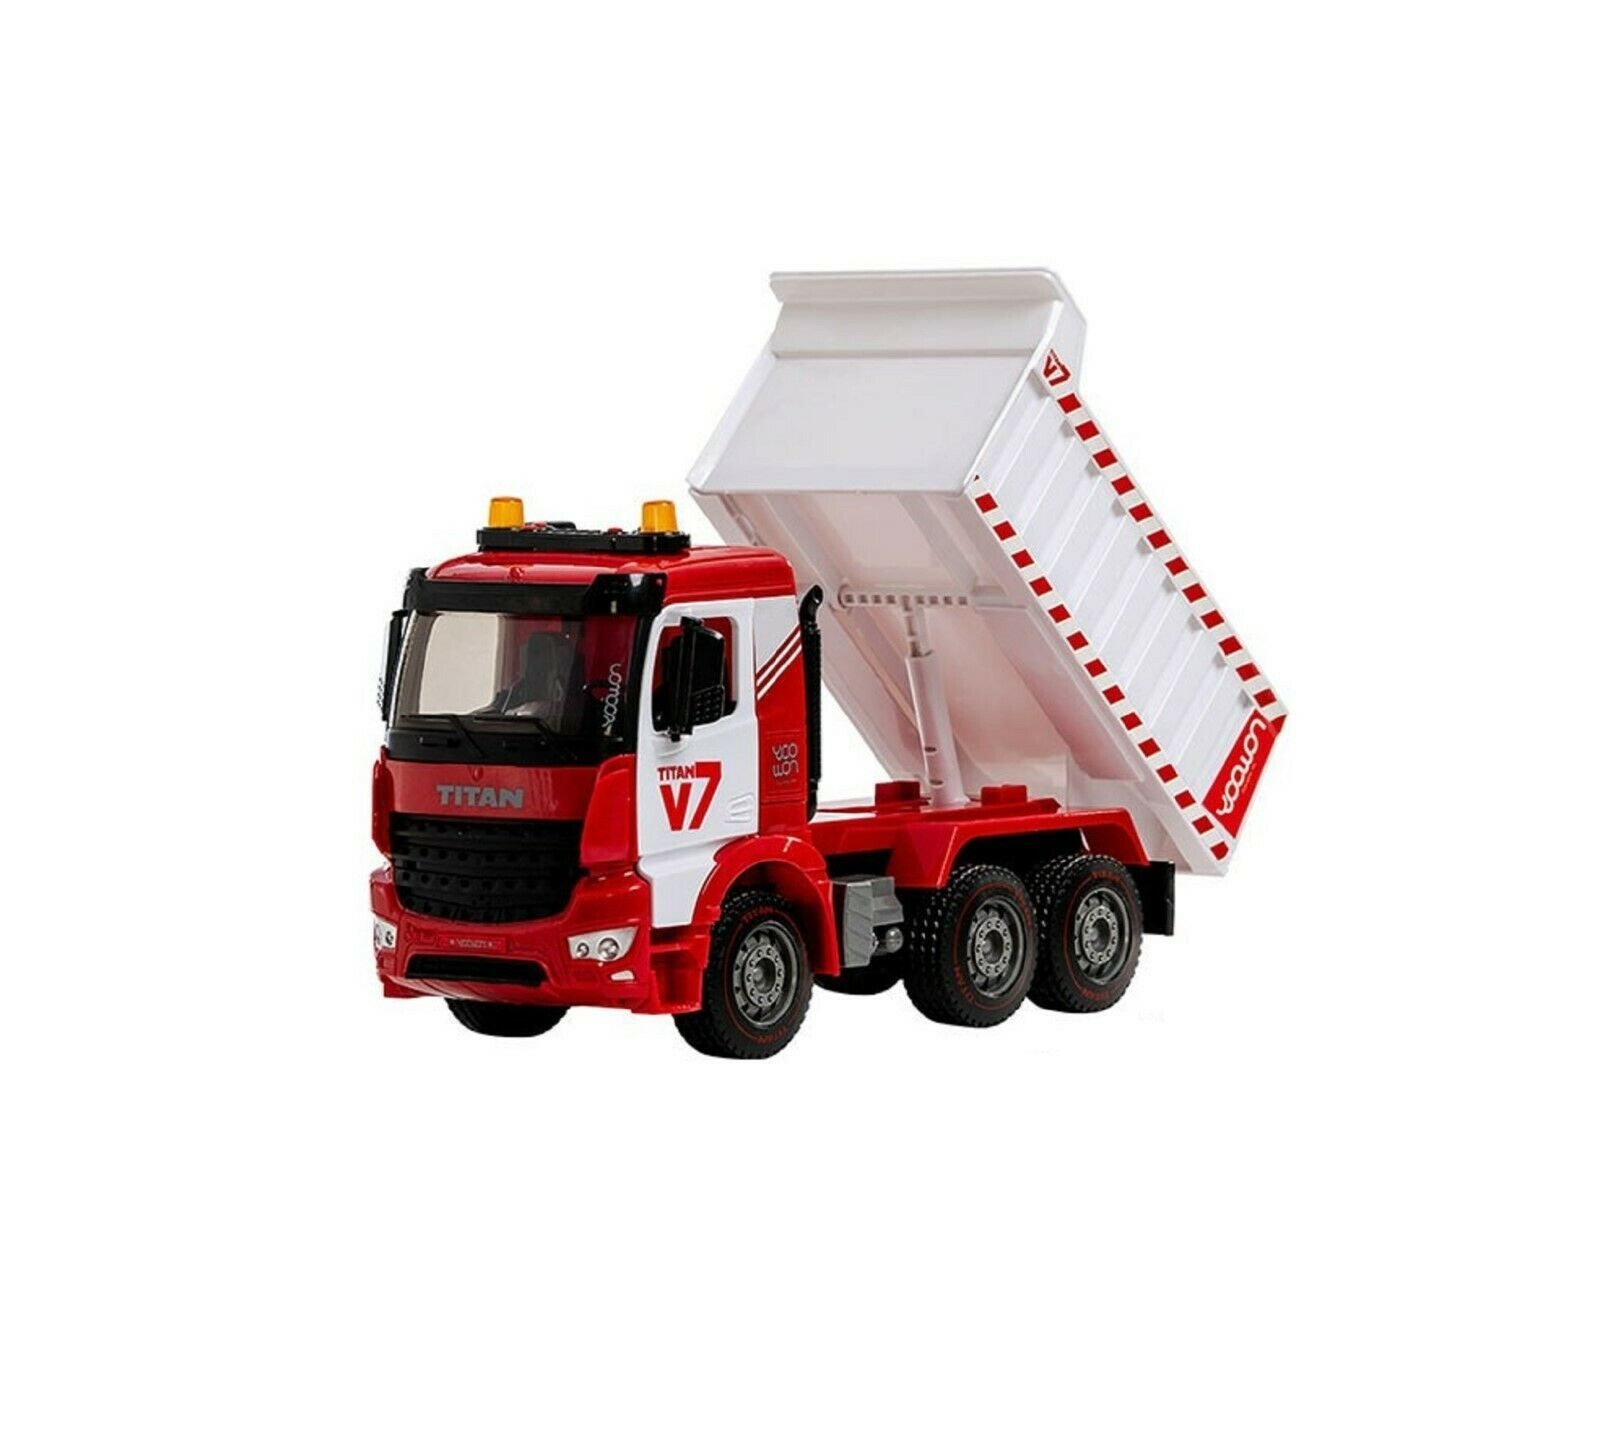 Yoowon Toys Titan Dump Truck Car Vehicle Sound Lights Heavy Equipment Play Toy